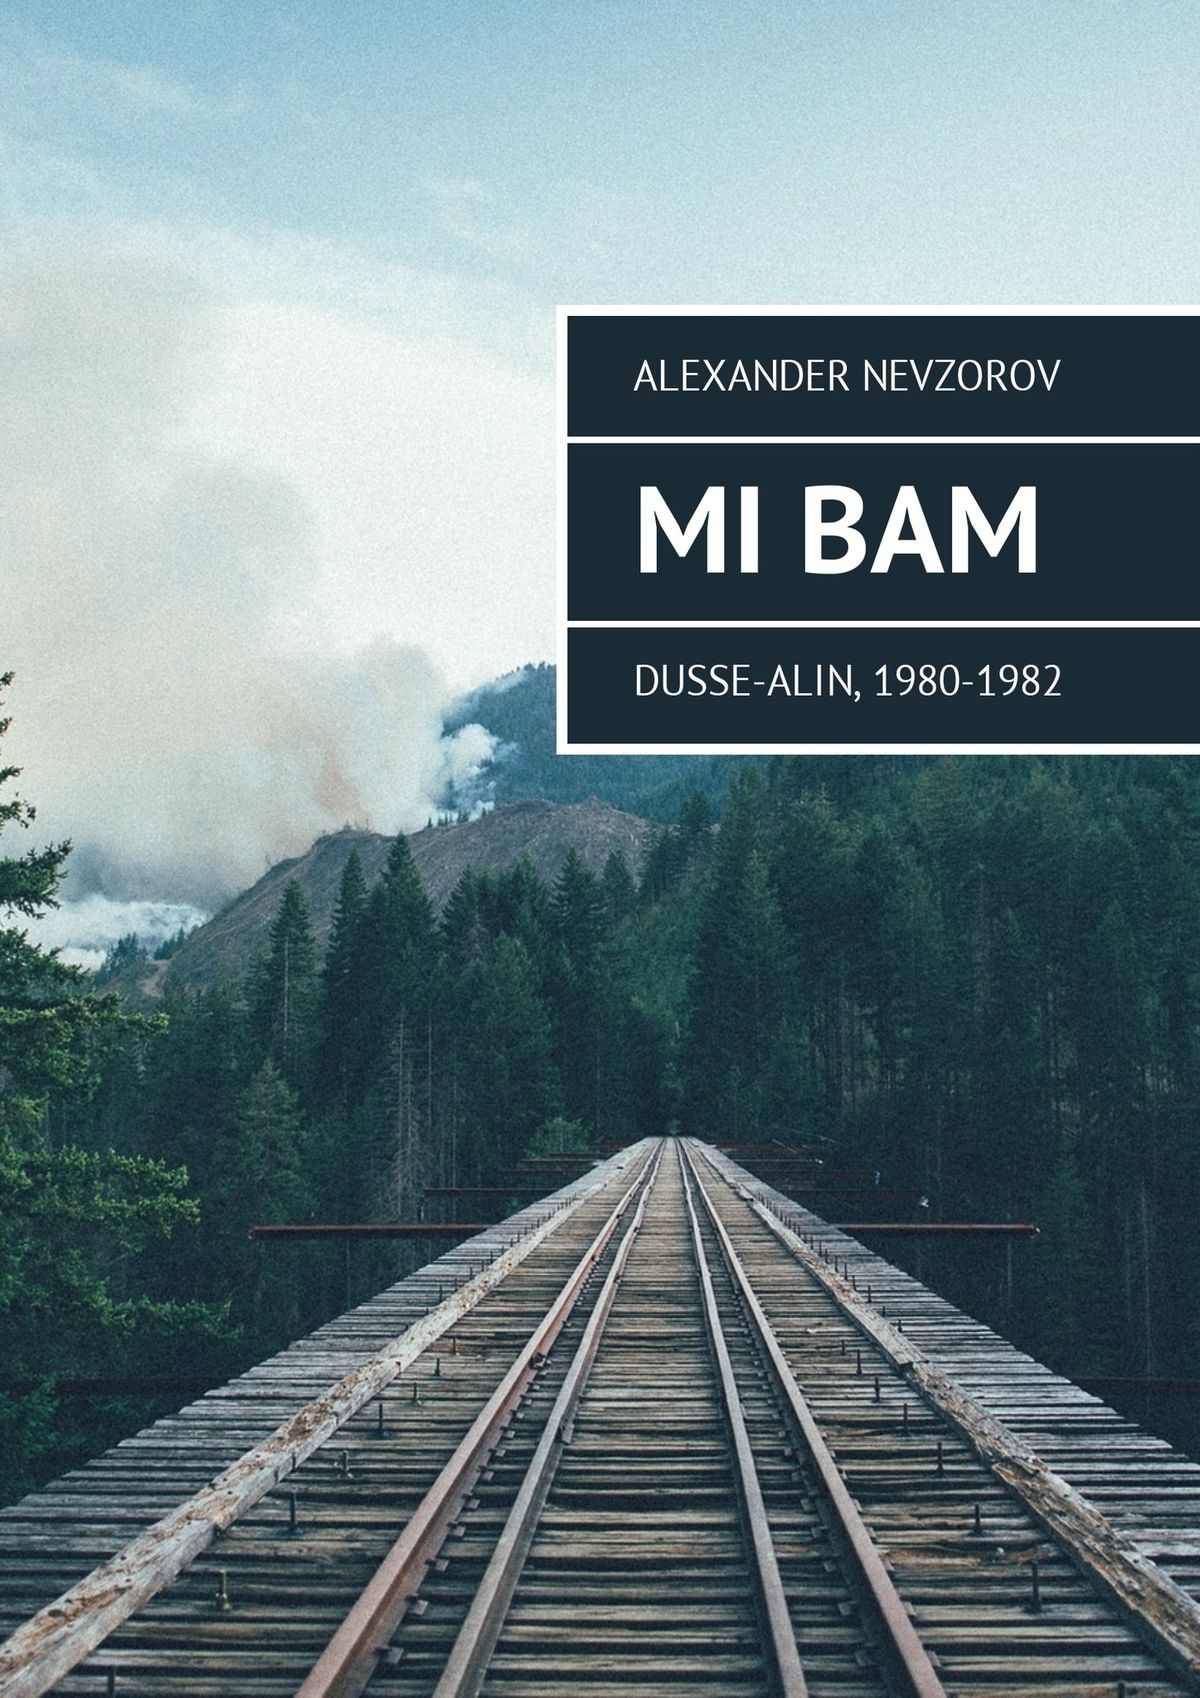 Александр Невзоров Mi BAM Dusse-Alin, 1980-1982